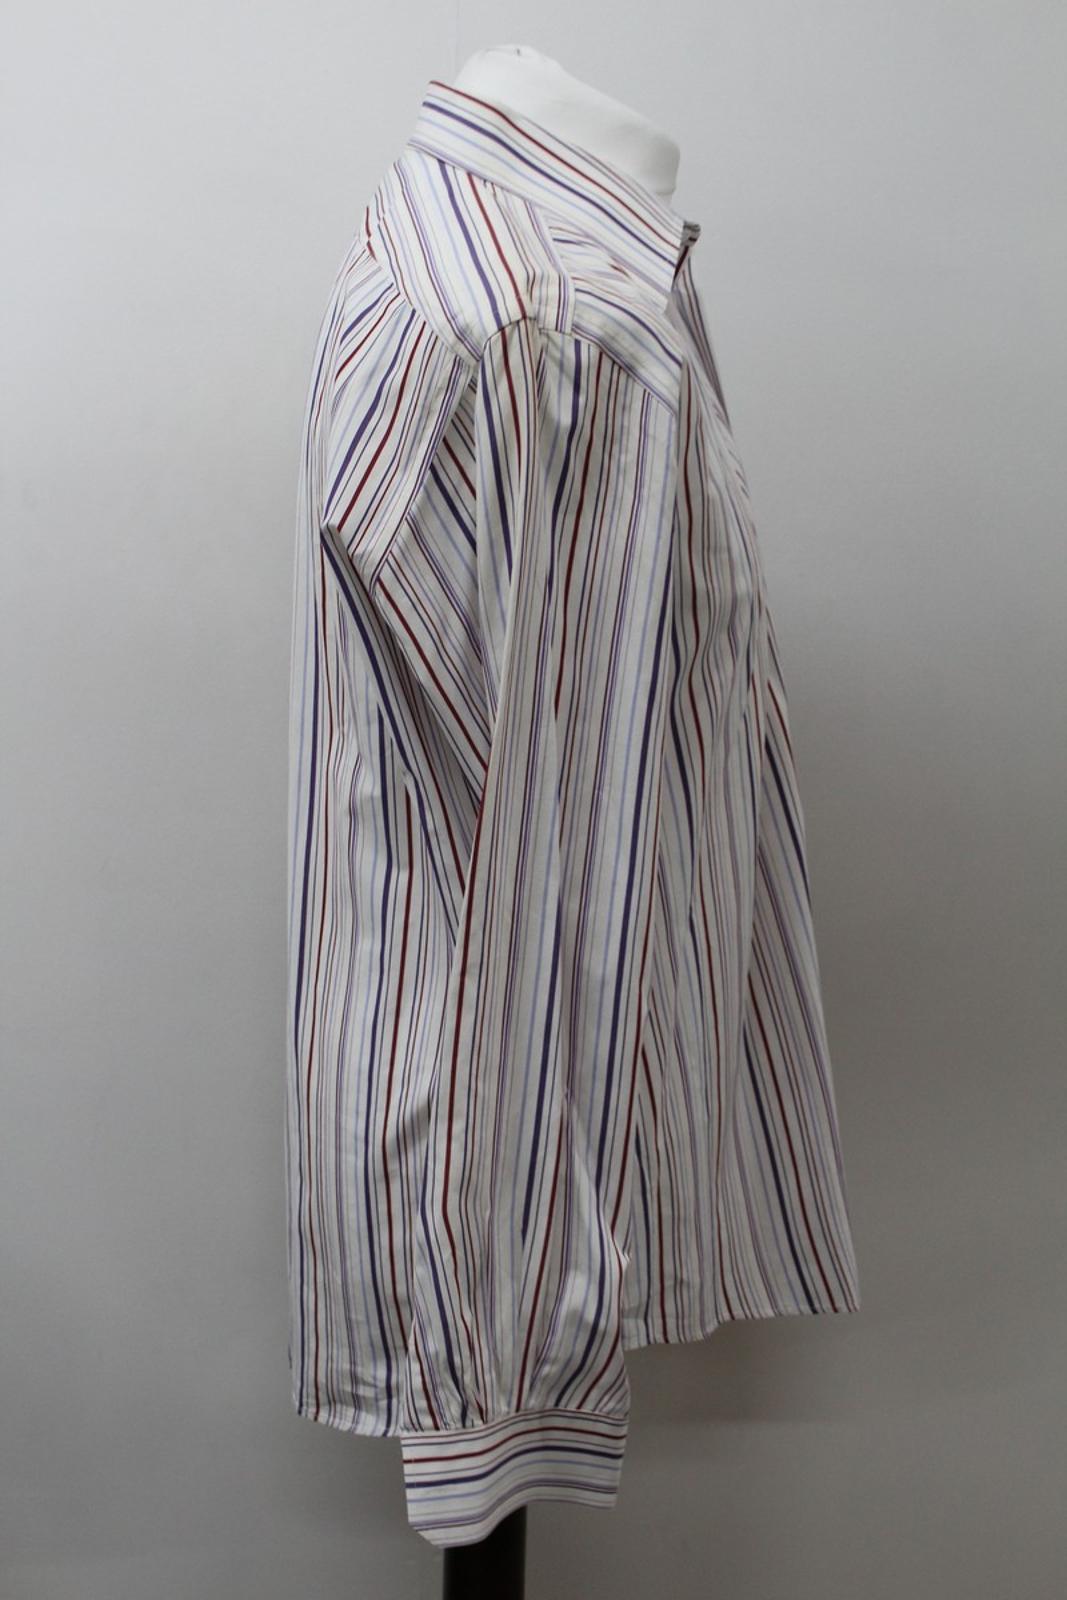 Hermes-para-hombre-Multi-Color-a-rayas-de-algodon-camisa-de-mangas-largas-cuello-16-5-034-42cm miniatura 4